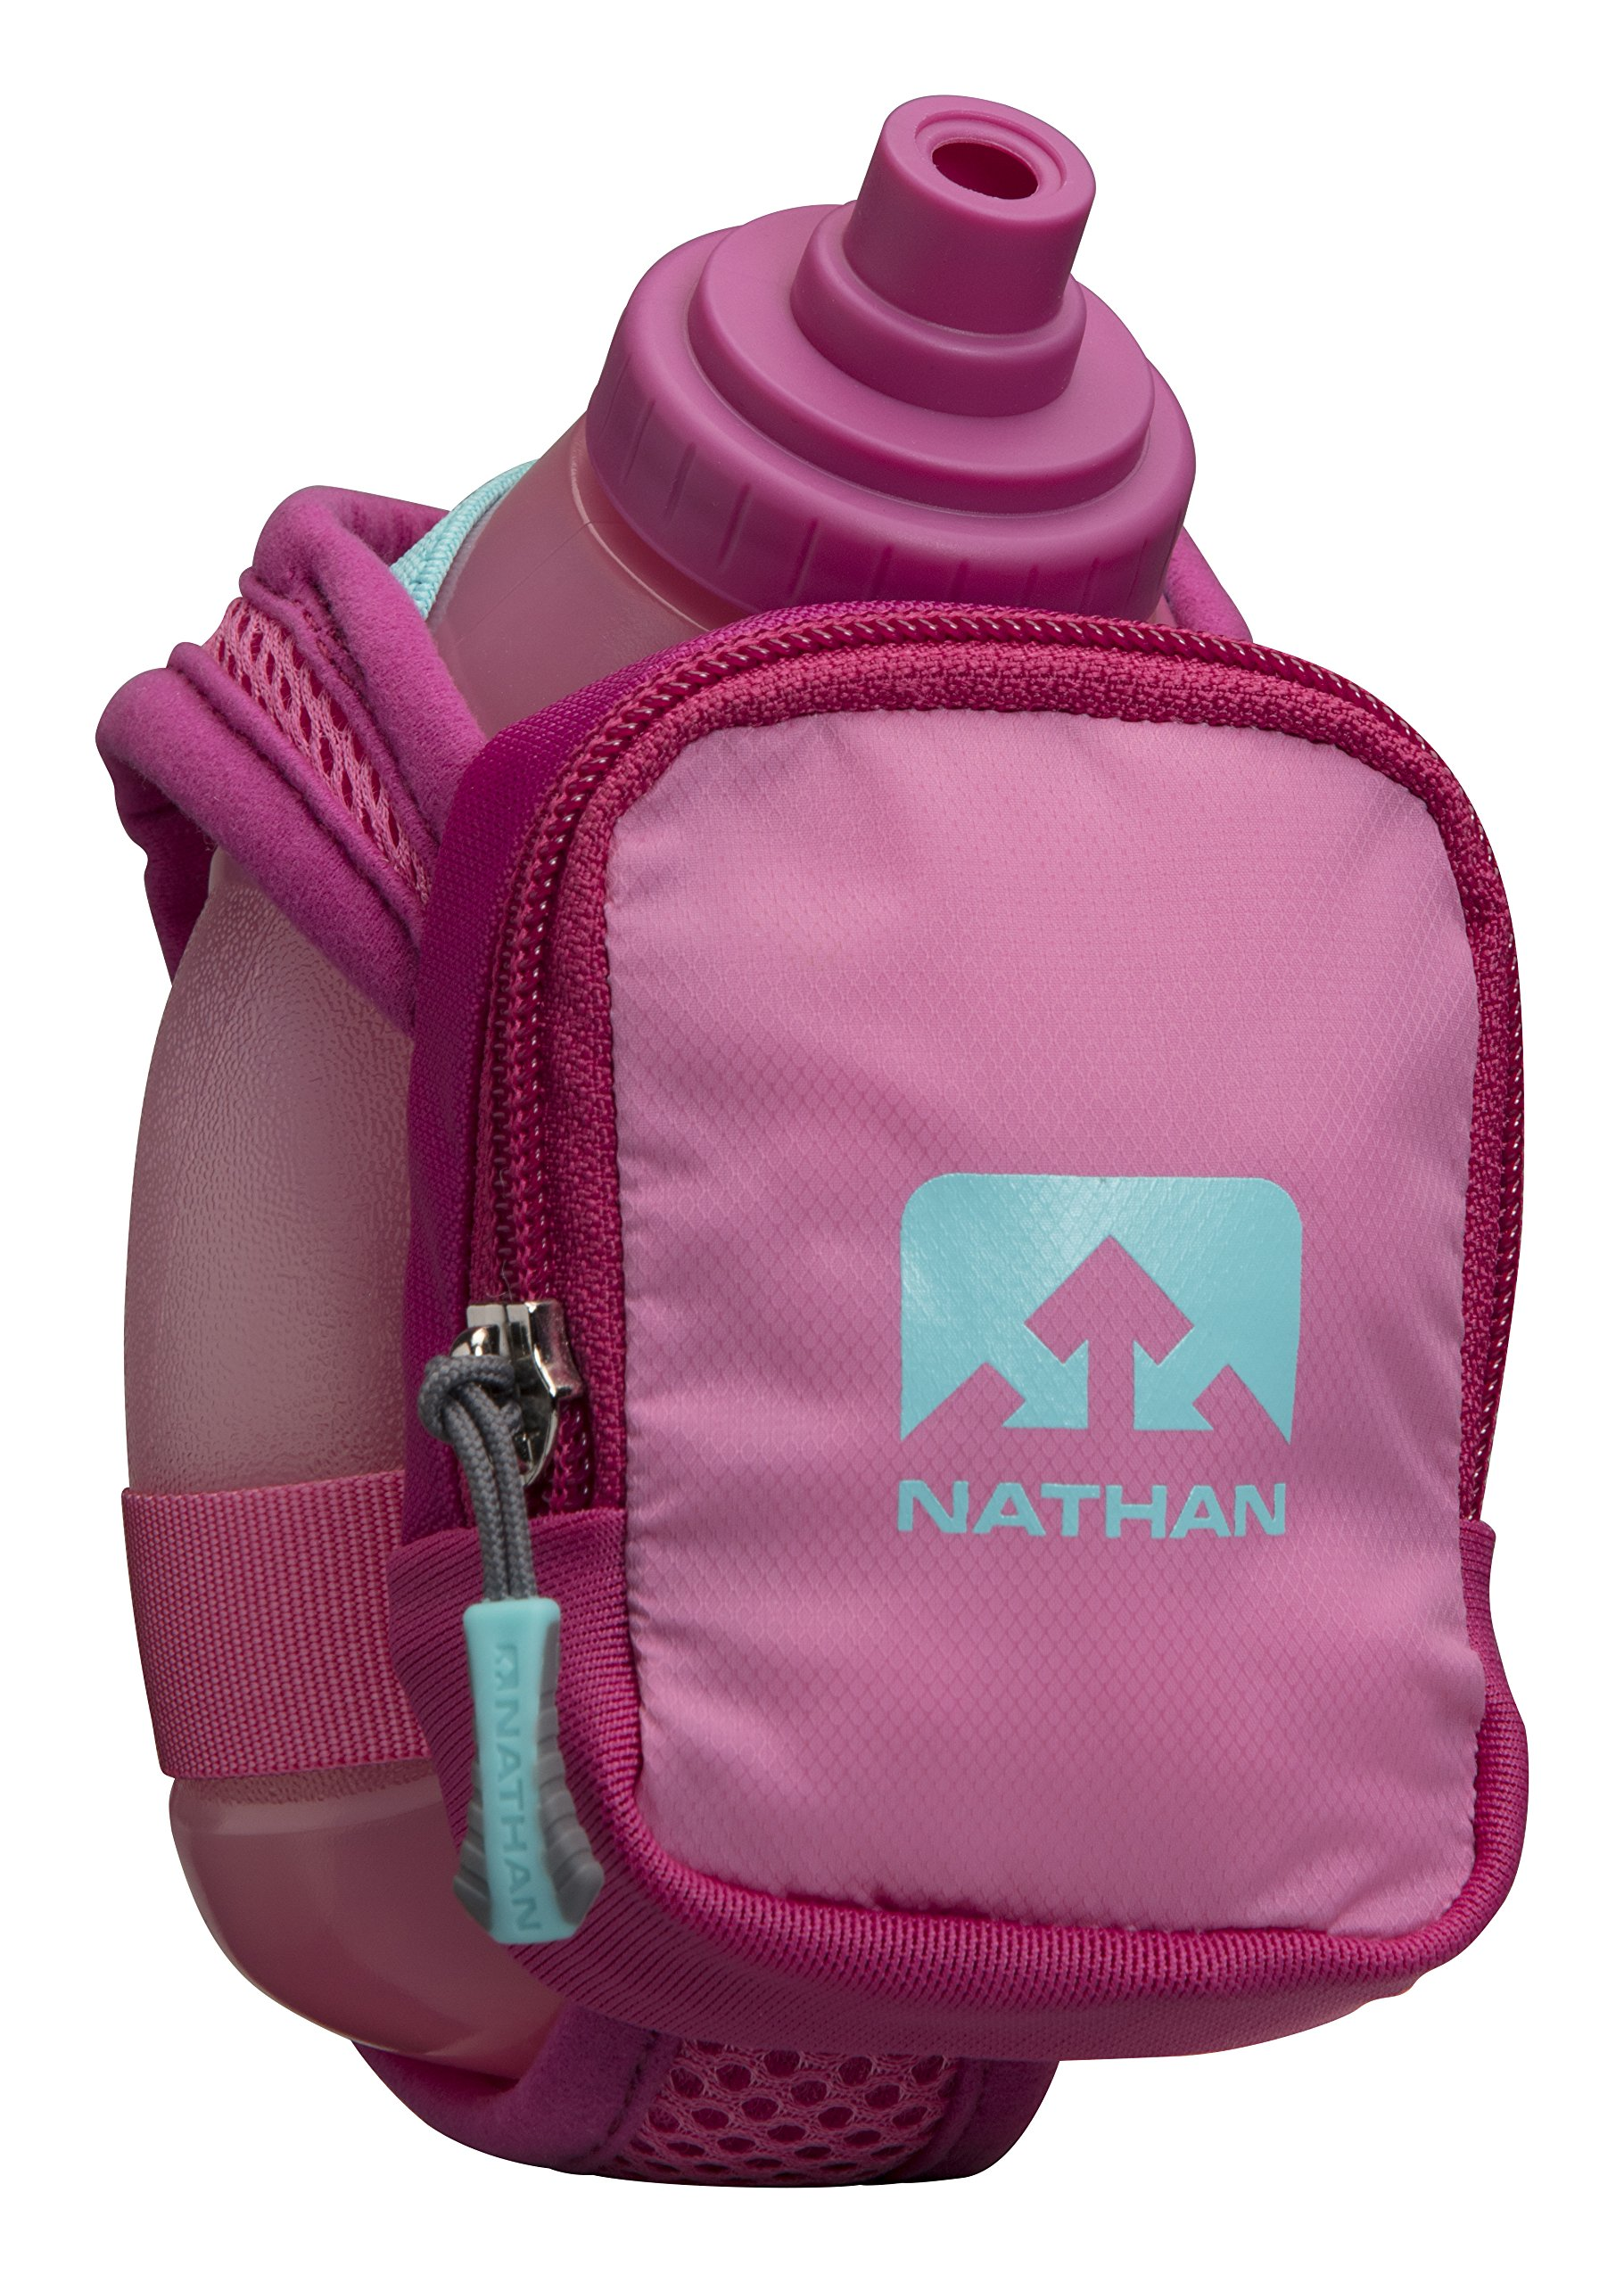 Nathan NS4836-0339-00 Quick Shot Plus Running Equipment, Azalea/Lilac Rose, One Size